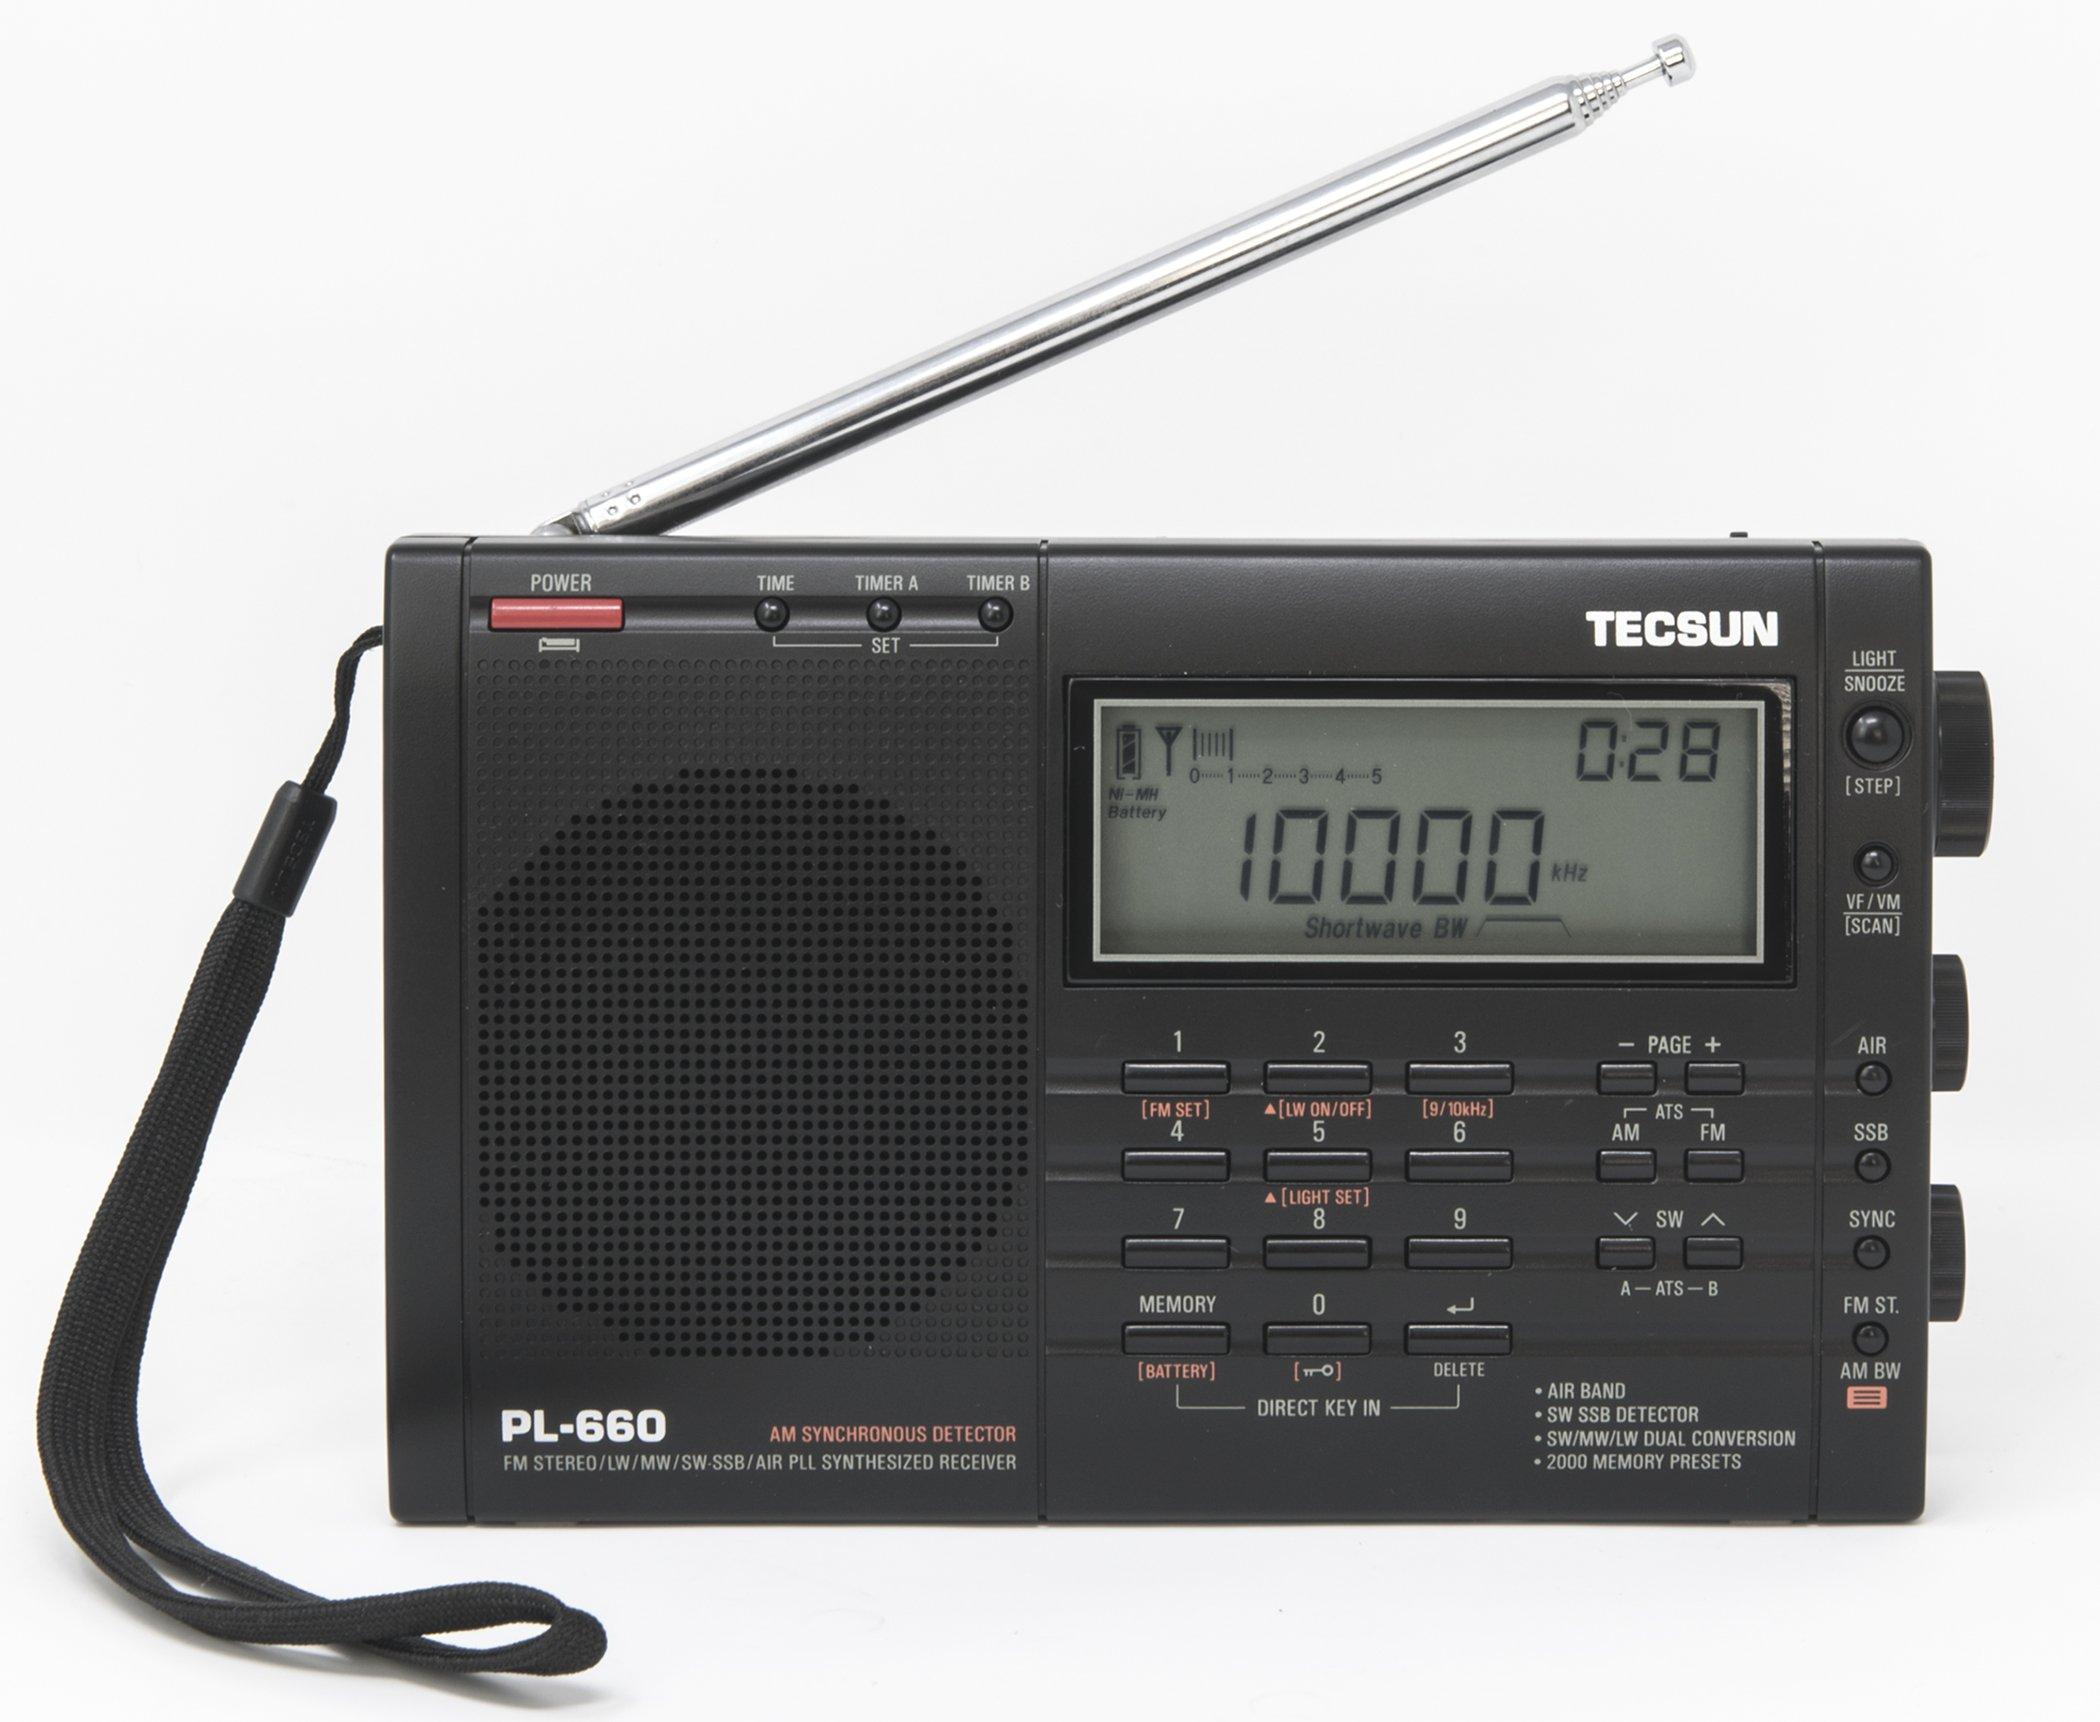 TECSUN PL-660 Portable AM/FM/LW/Air Shortwave World Band Radio with Single Side Band, Black